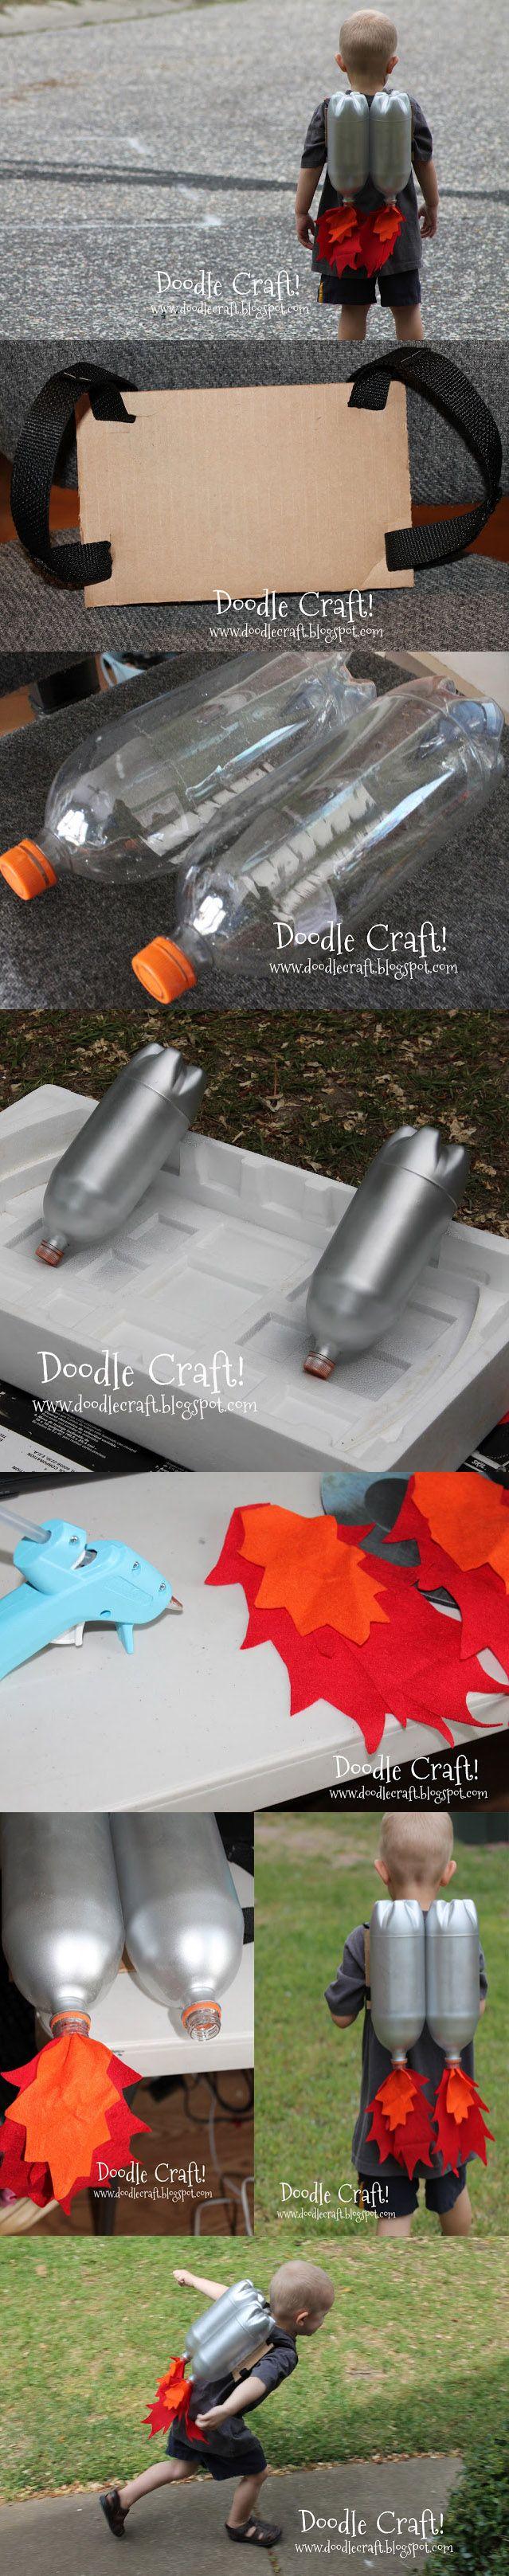 Mochila voladora de juguete DIY / de Doodle Craft